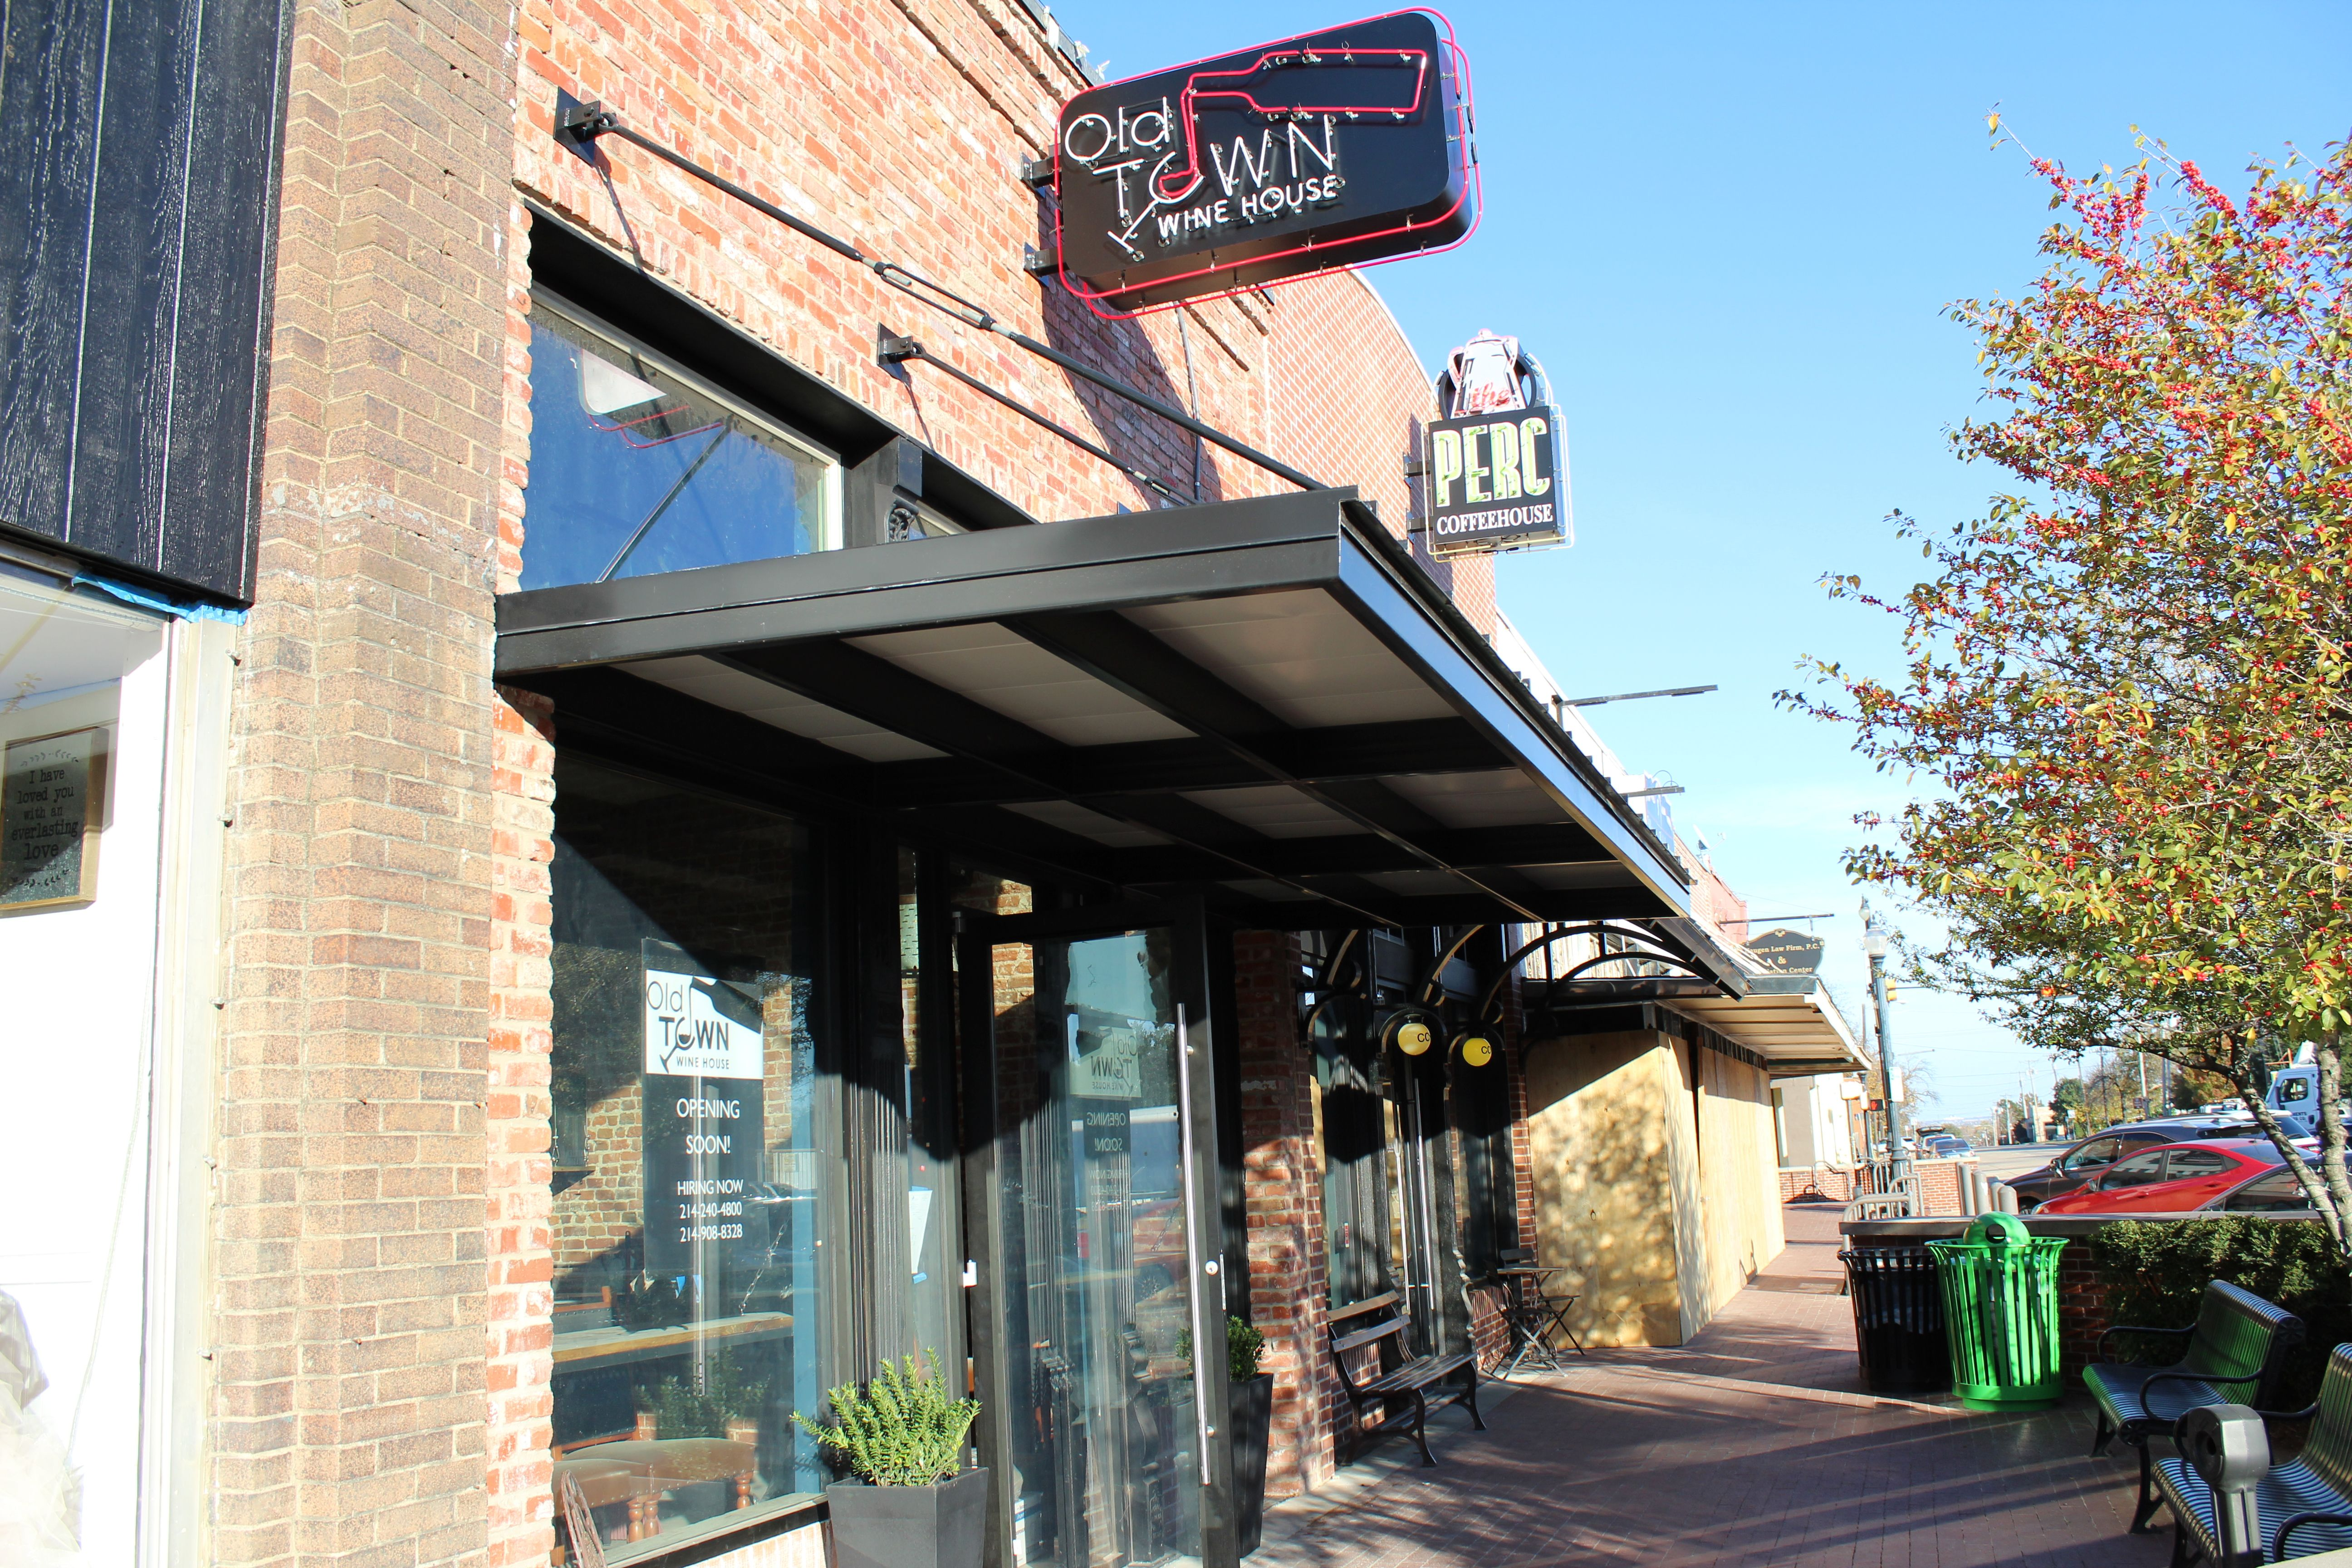 Old Town Wine House Old Town Lewisville TX oldtown